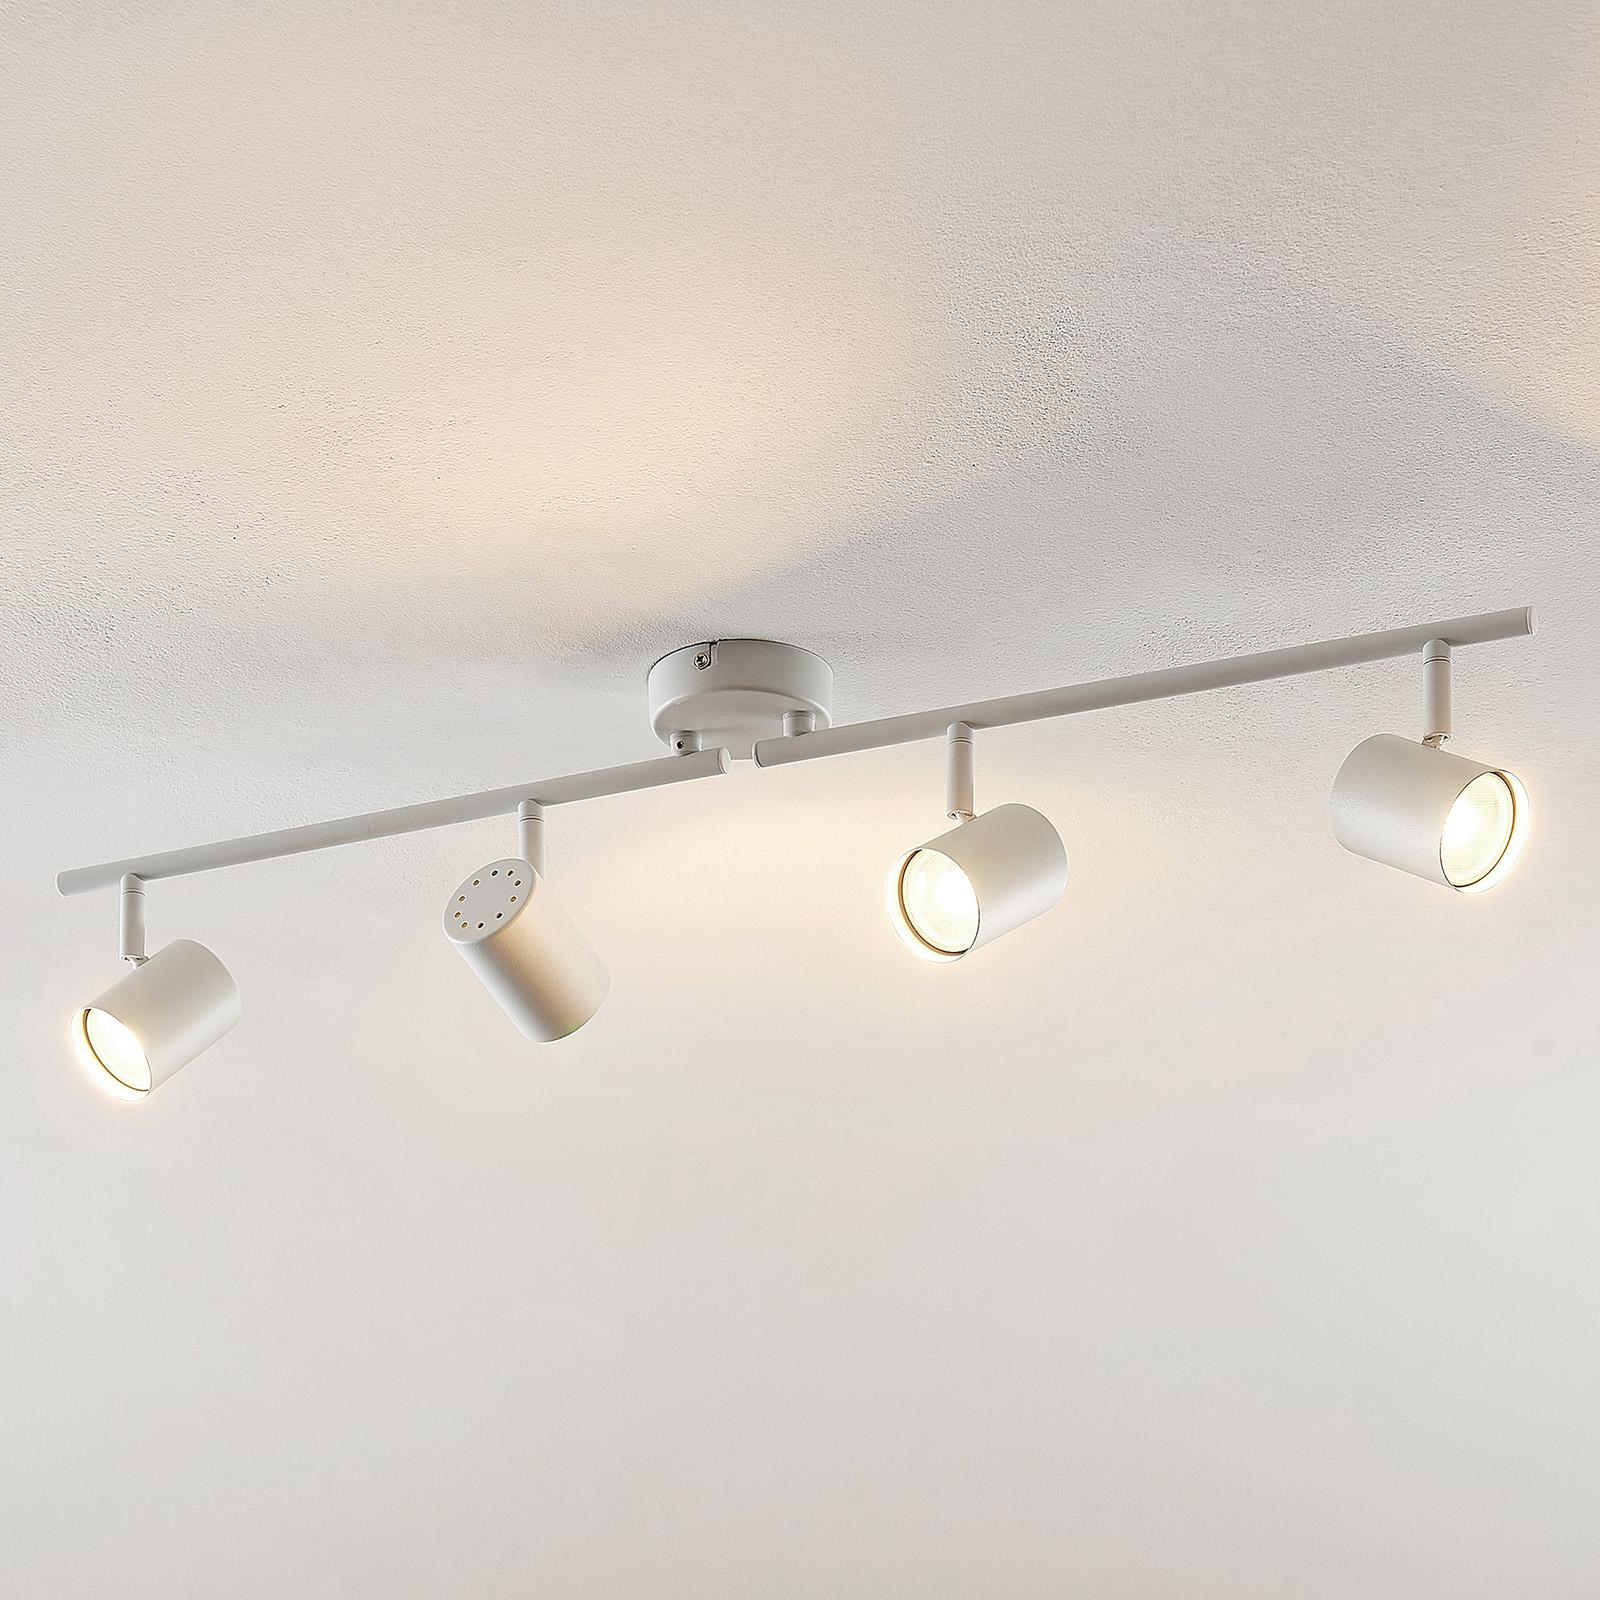 ELC Tomoki -LED-kohdevalo, valkoinen, 4-lamp.